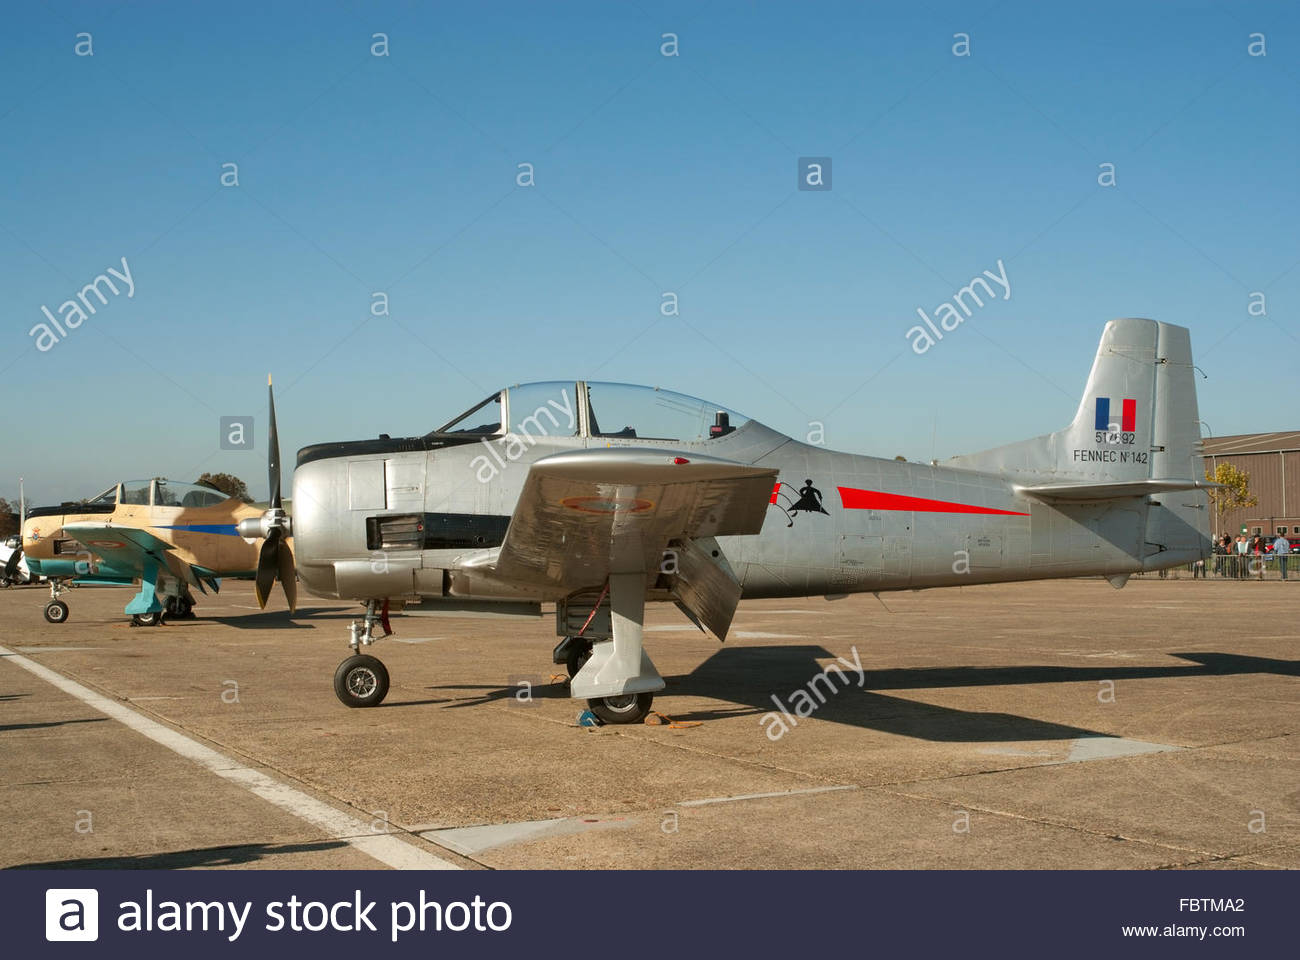 T-28 Fennec trainer plane - Stock Image